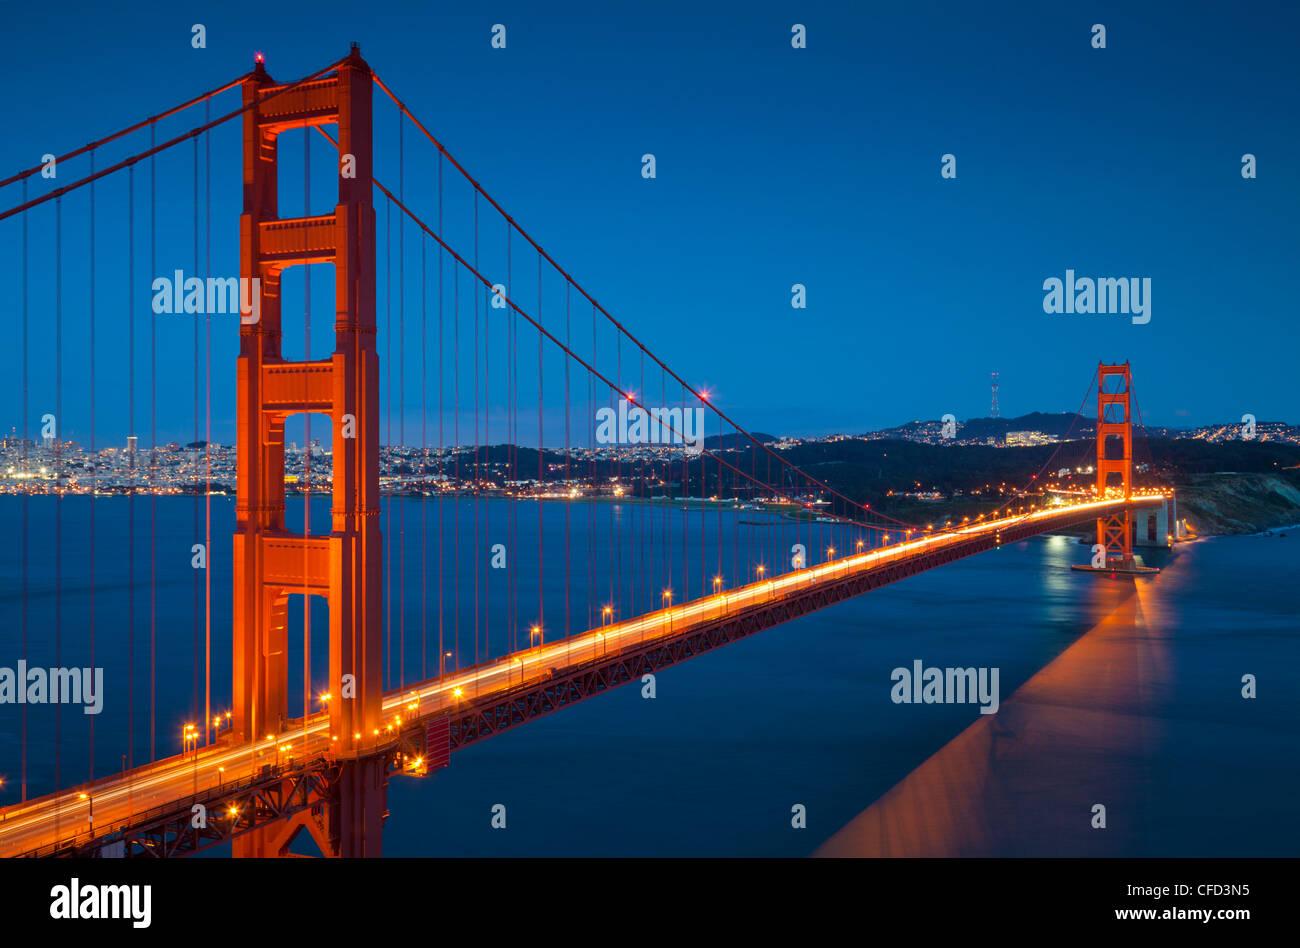 Le Golden Gate Bridge, du Marin Headlands la nuit, comté de Marin, San Francisco, California, USA Photo Stock